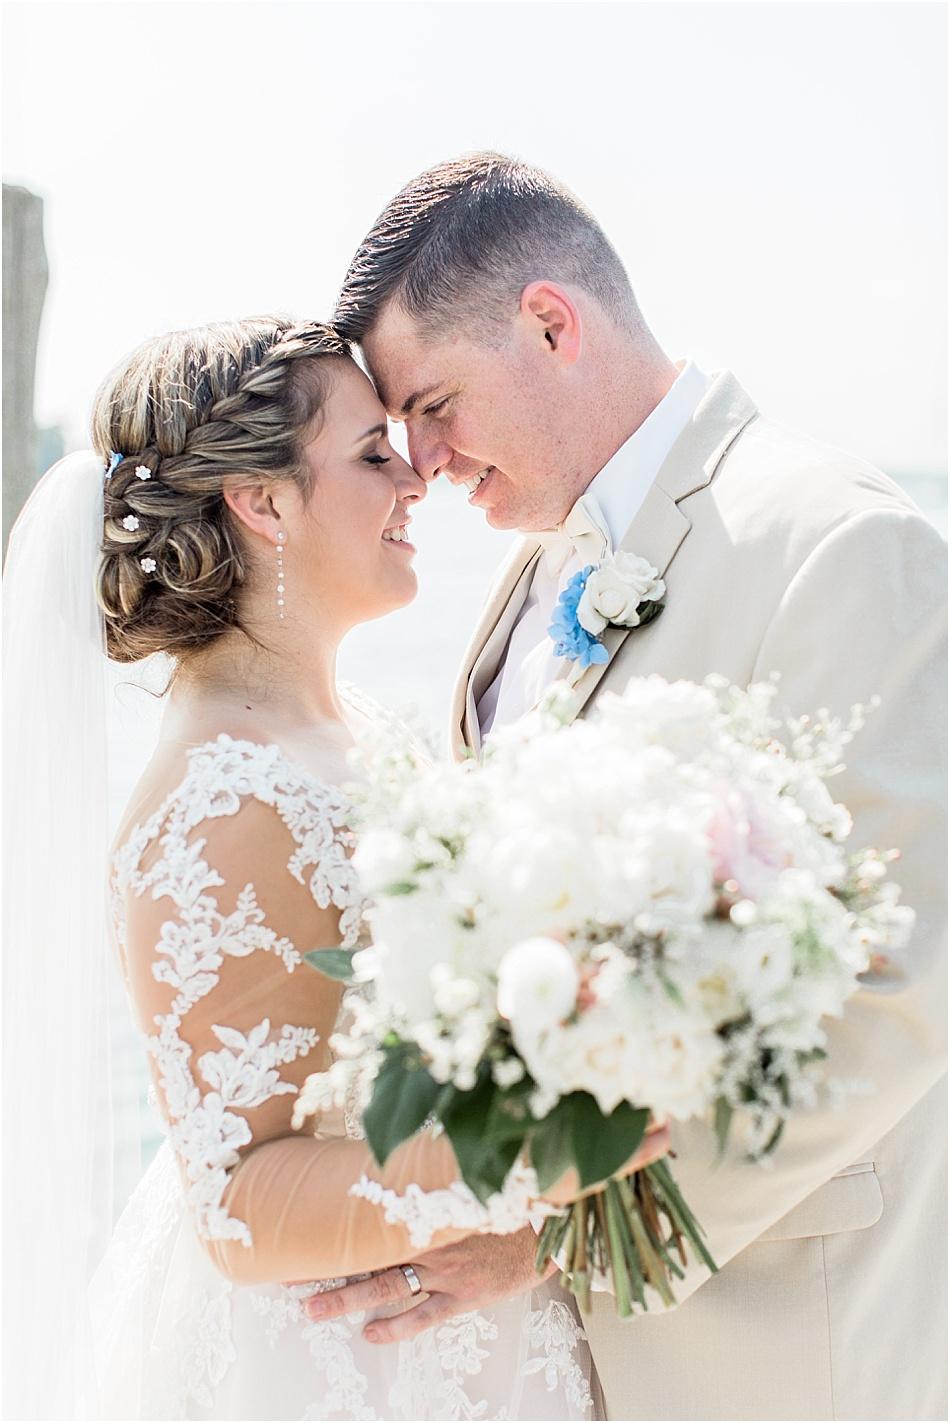 brookside_country_club_cape_cod_boston_wedding_photographer_Meredith_Jane_Photography_photo_0138.jpg